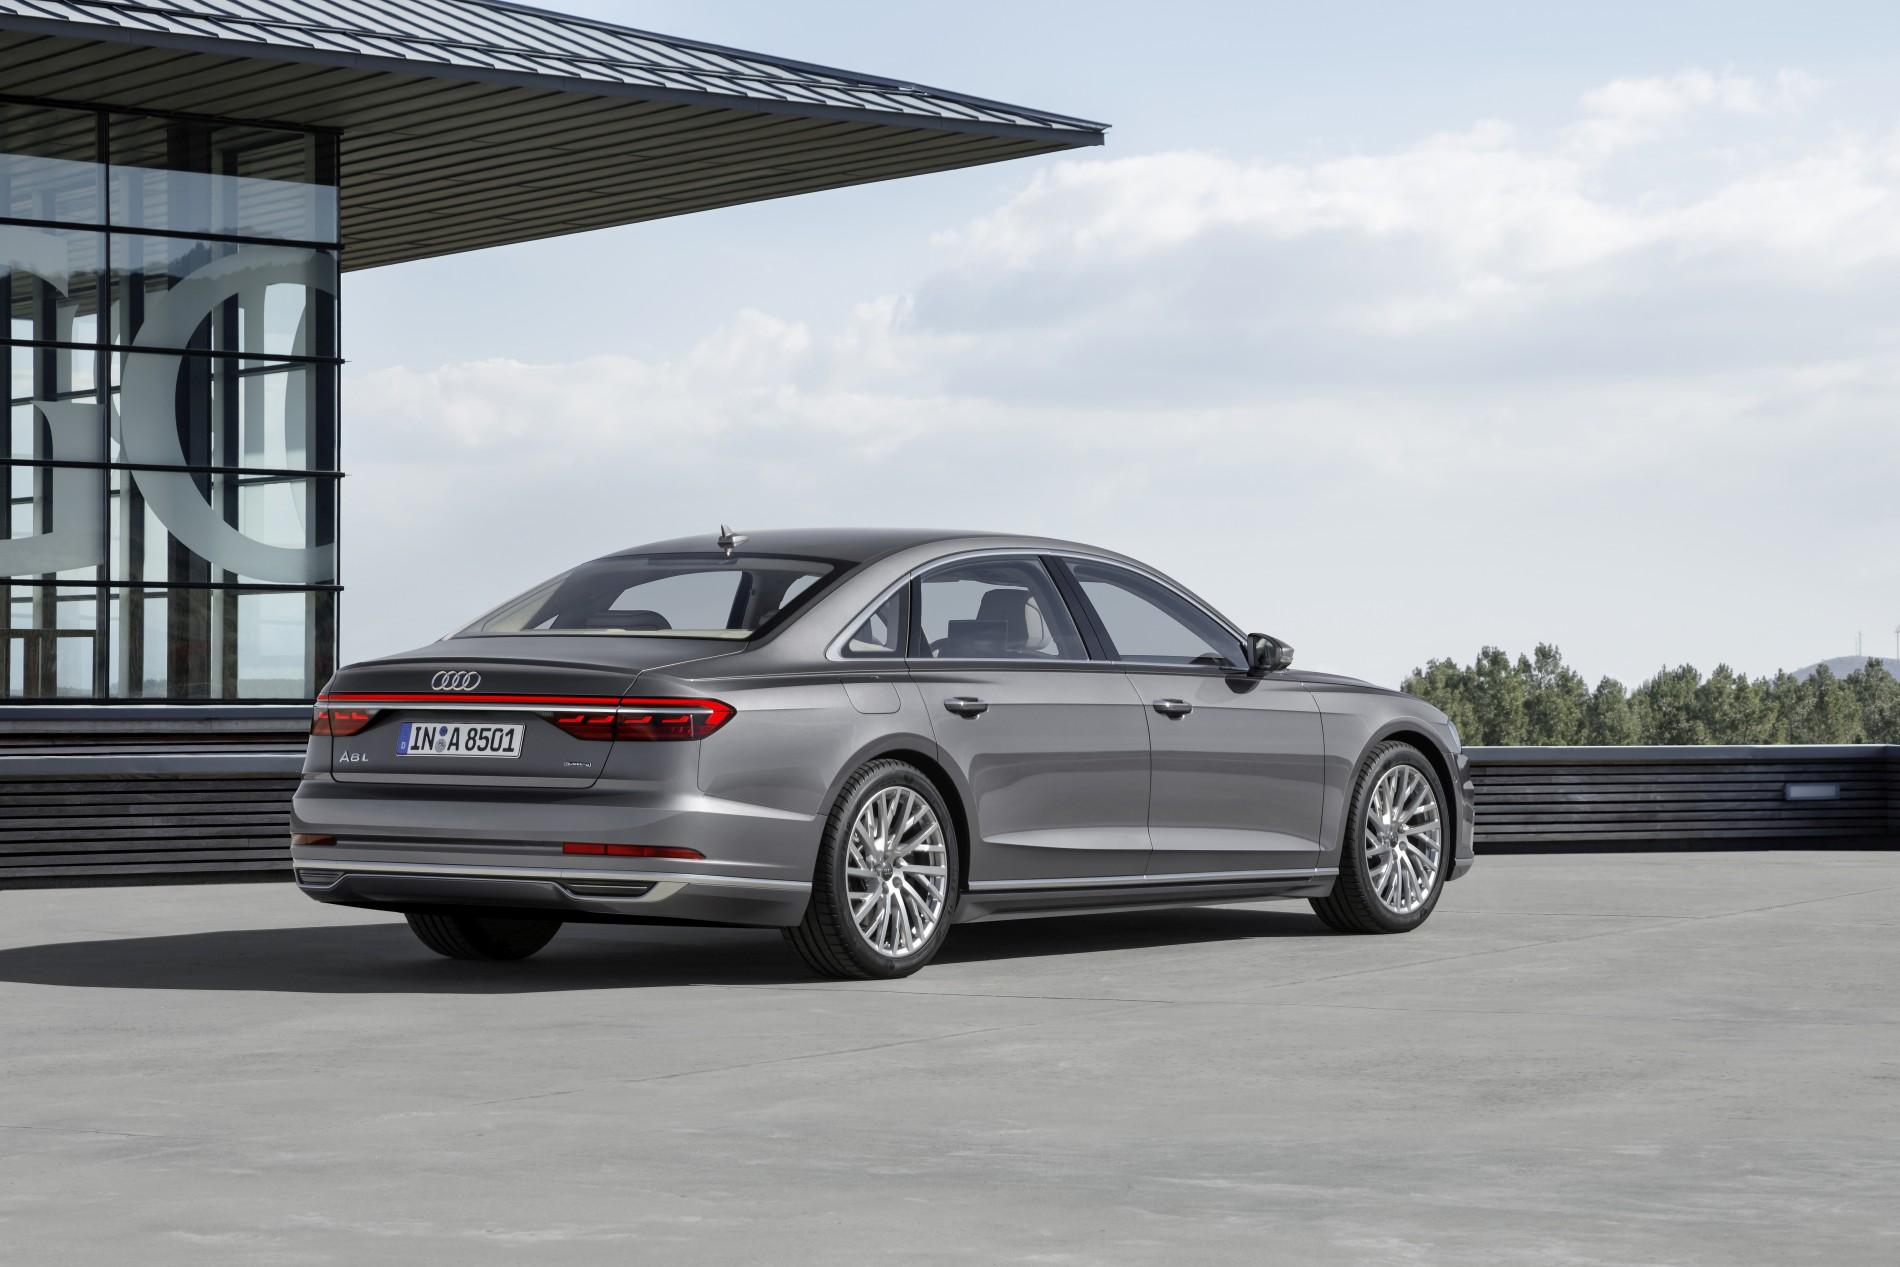 Audi 8 L